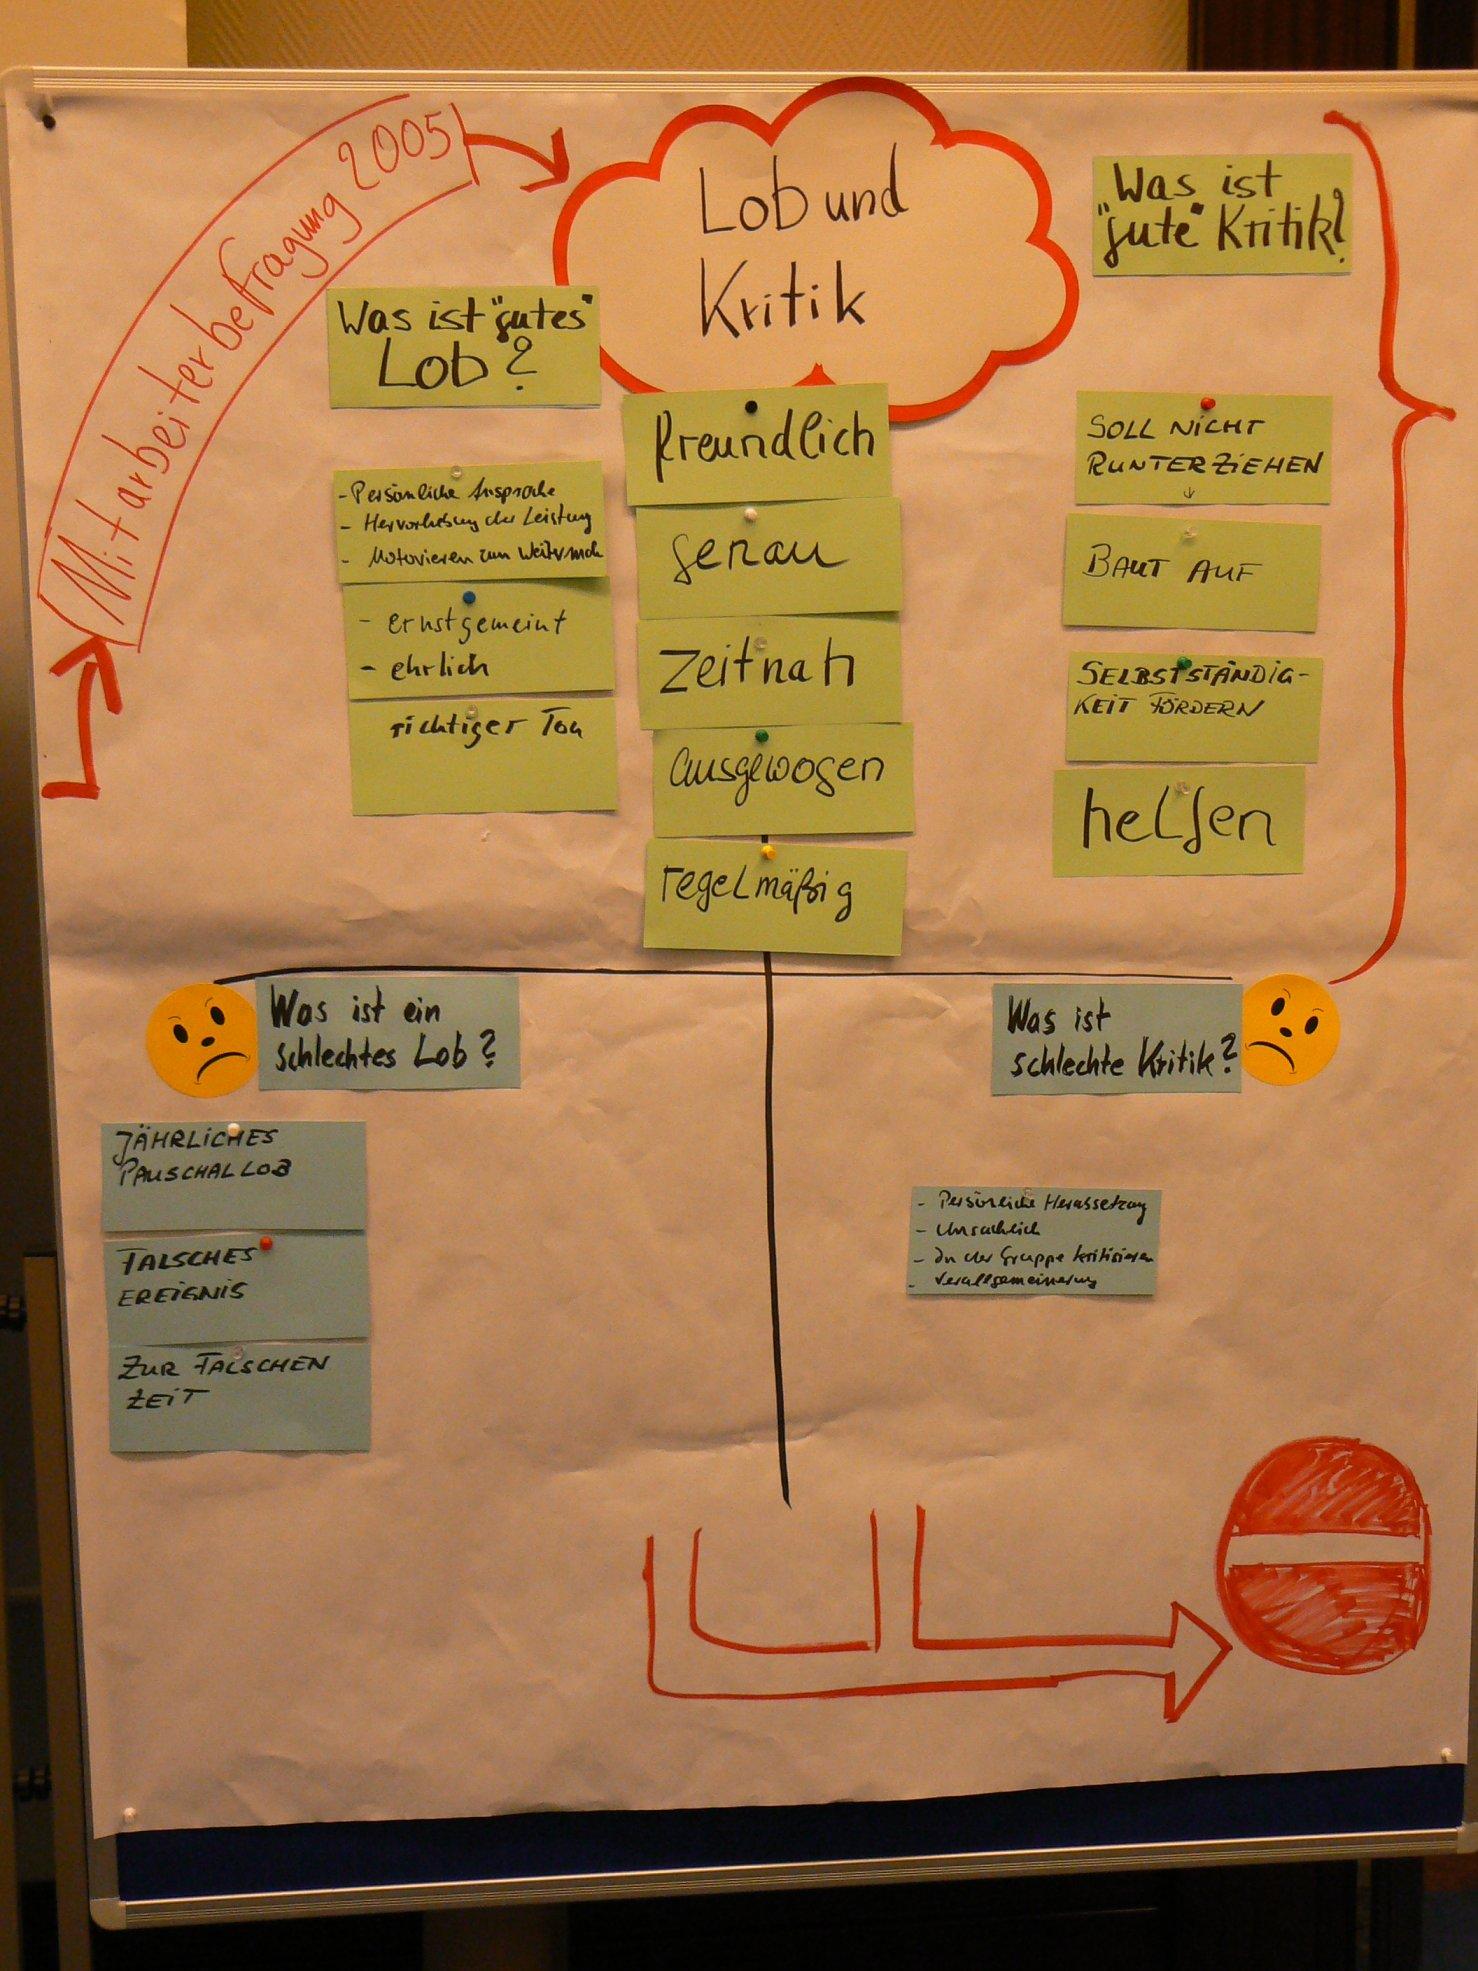 Lob, Anerkennung, Kritik, Kriterien für gutes Lob, gute Kritik Metaplanwand